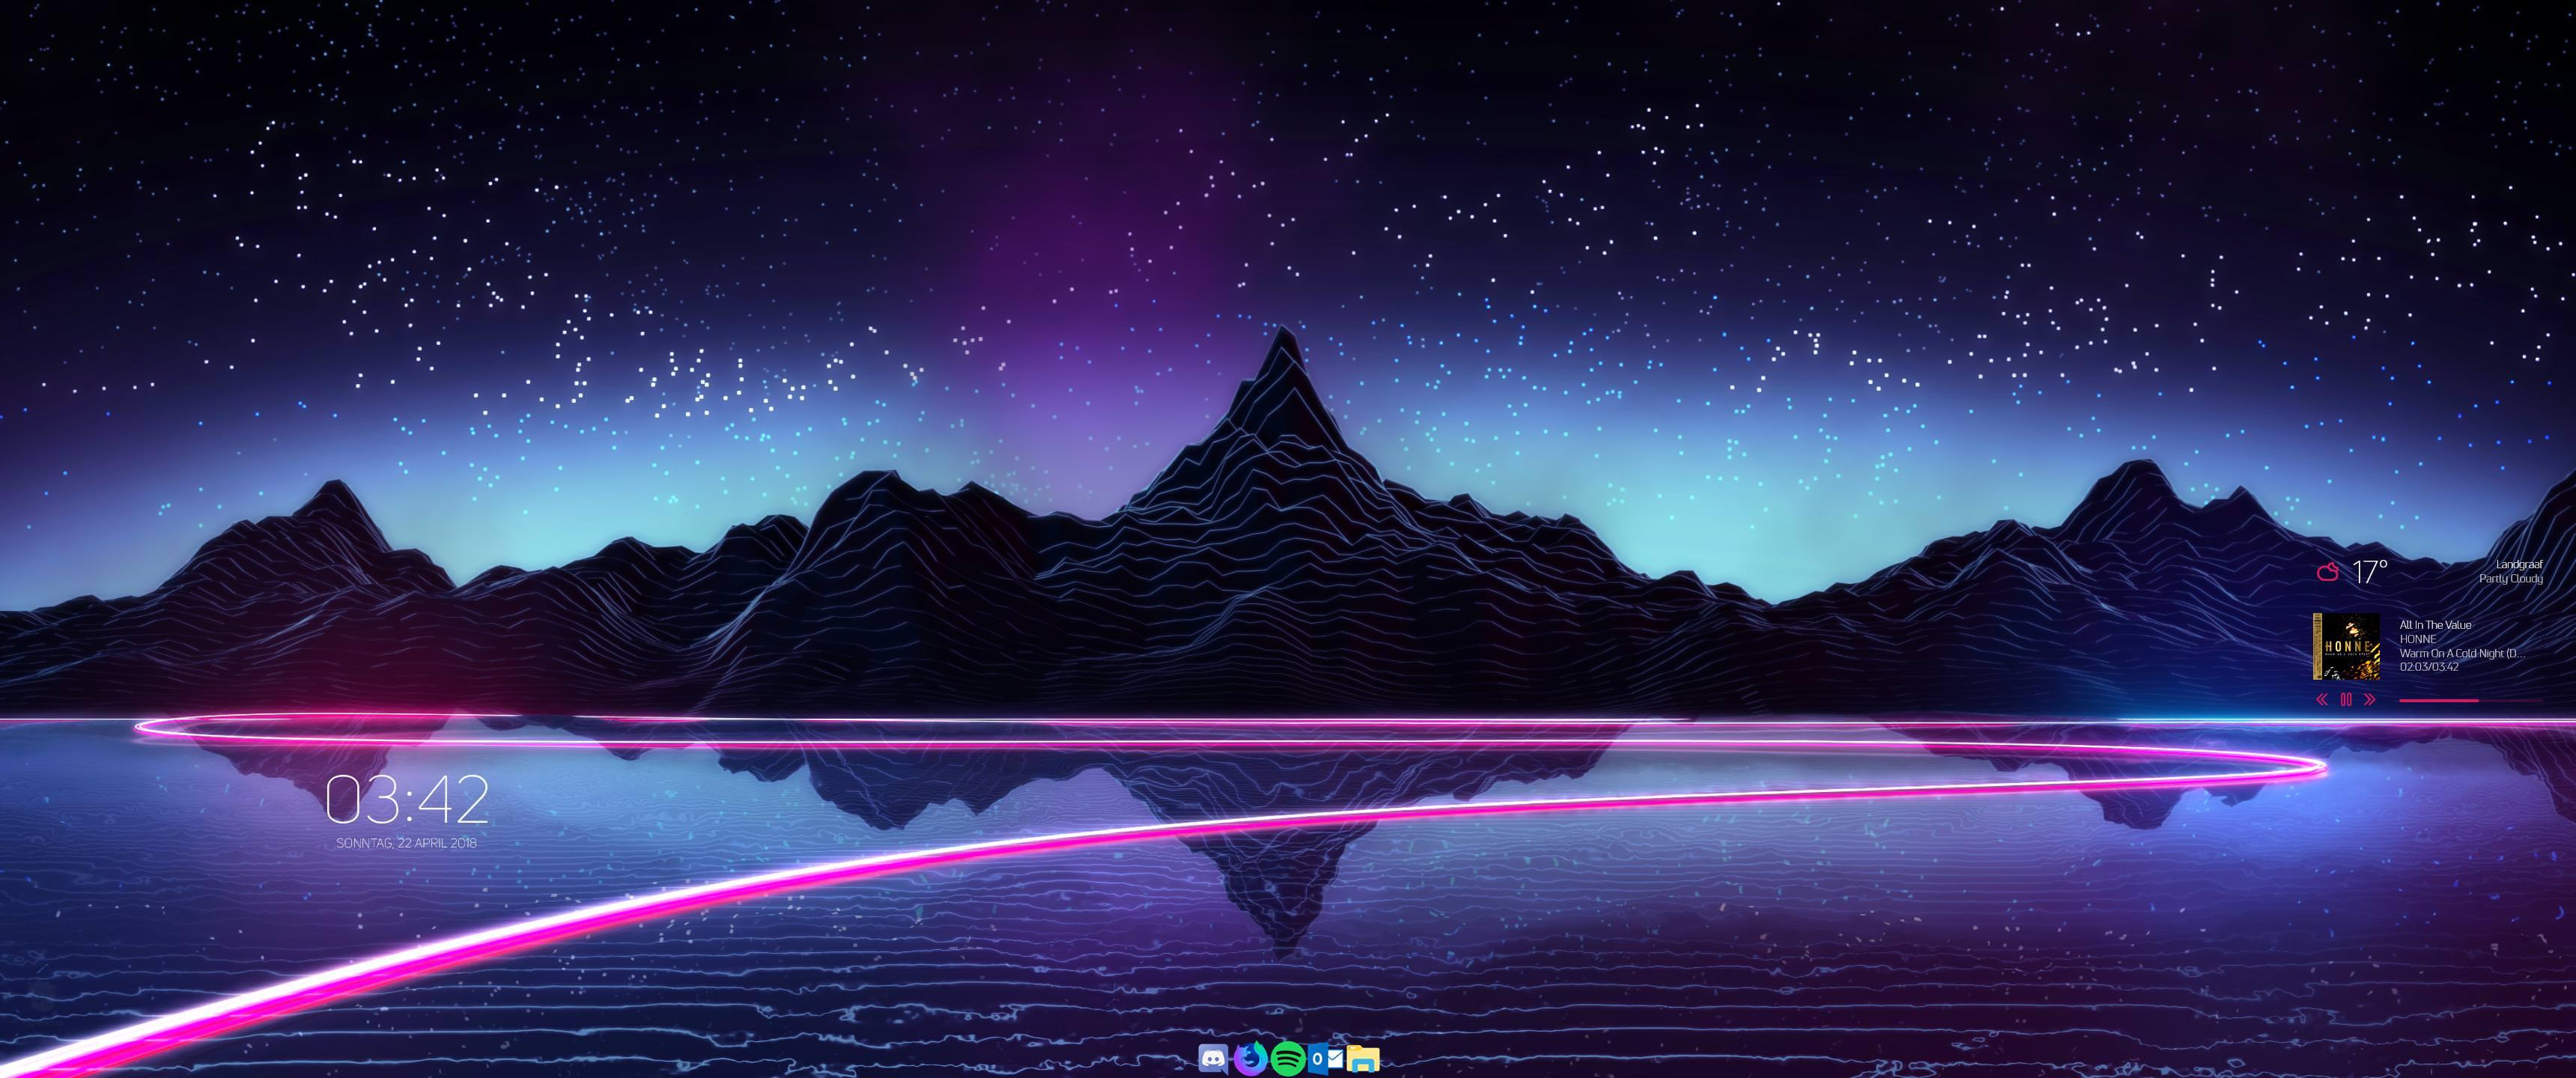 My minimalistic Desktop Setup after getting a new ultrawide Screen 3440x1440